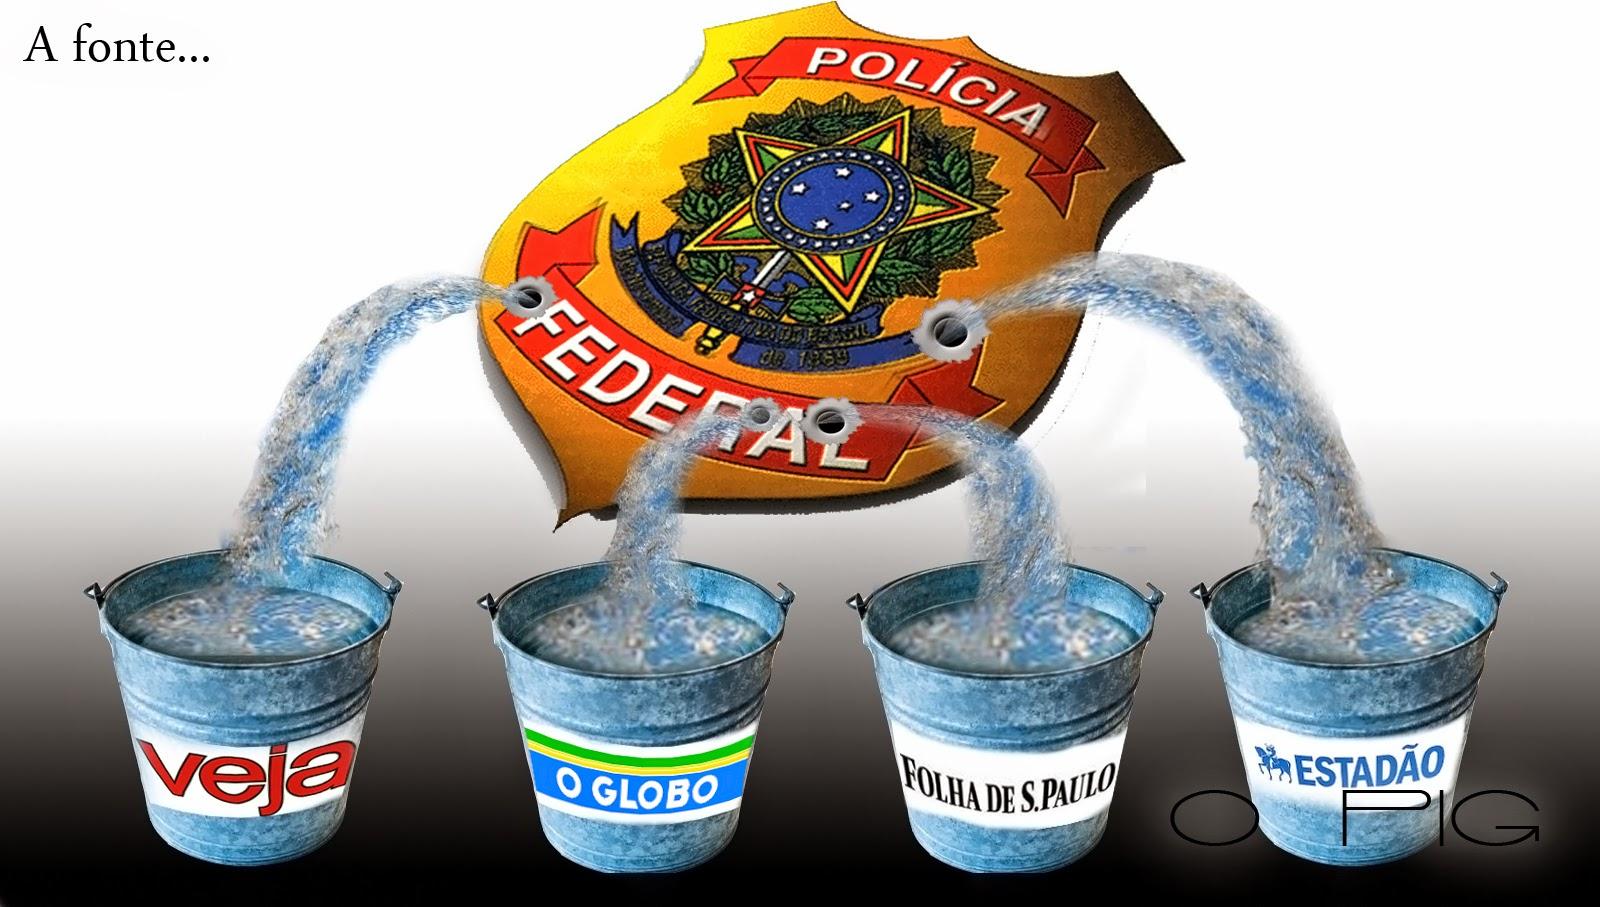 Lava Jato: Especialistas criticam vazamento de conversa entre cliente e advogado